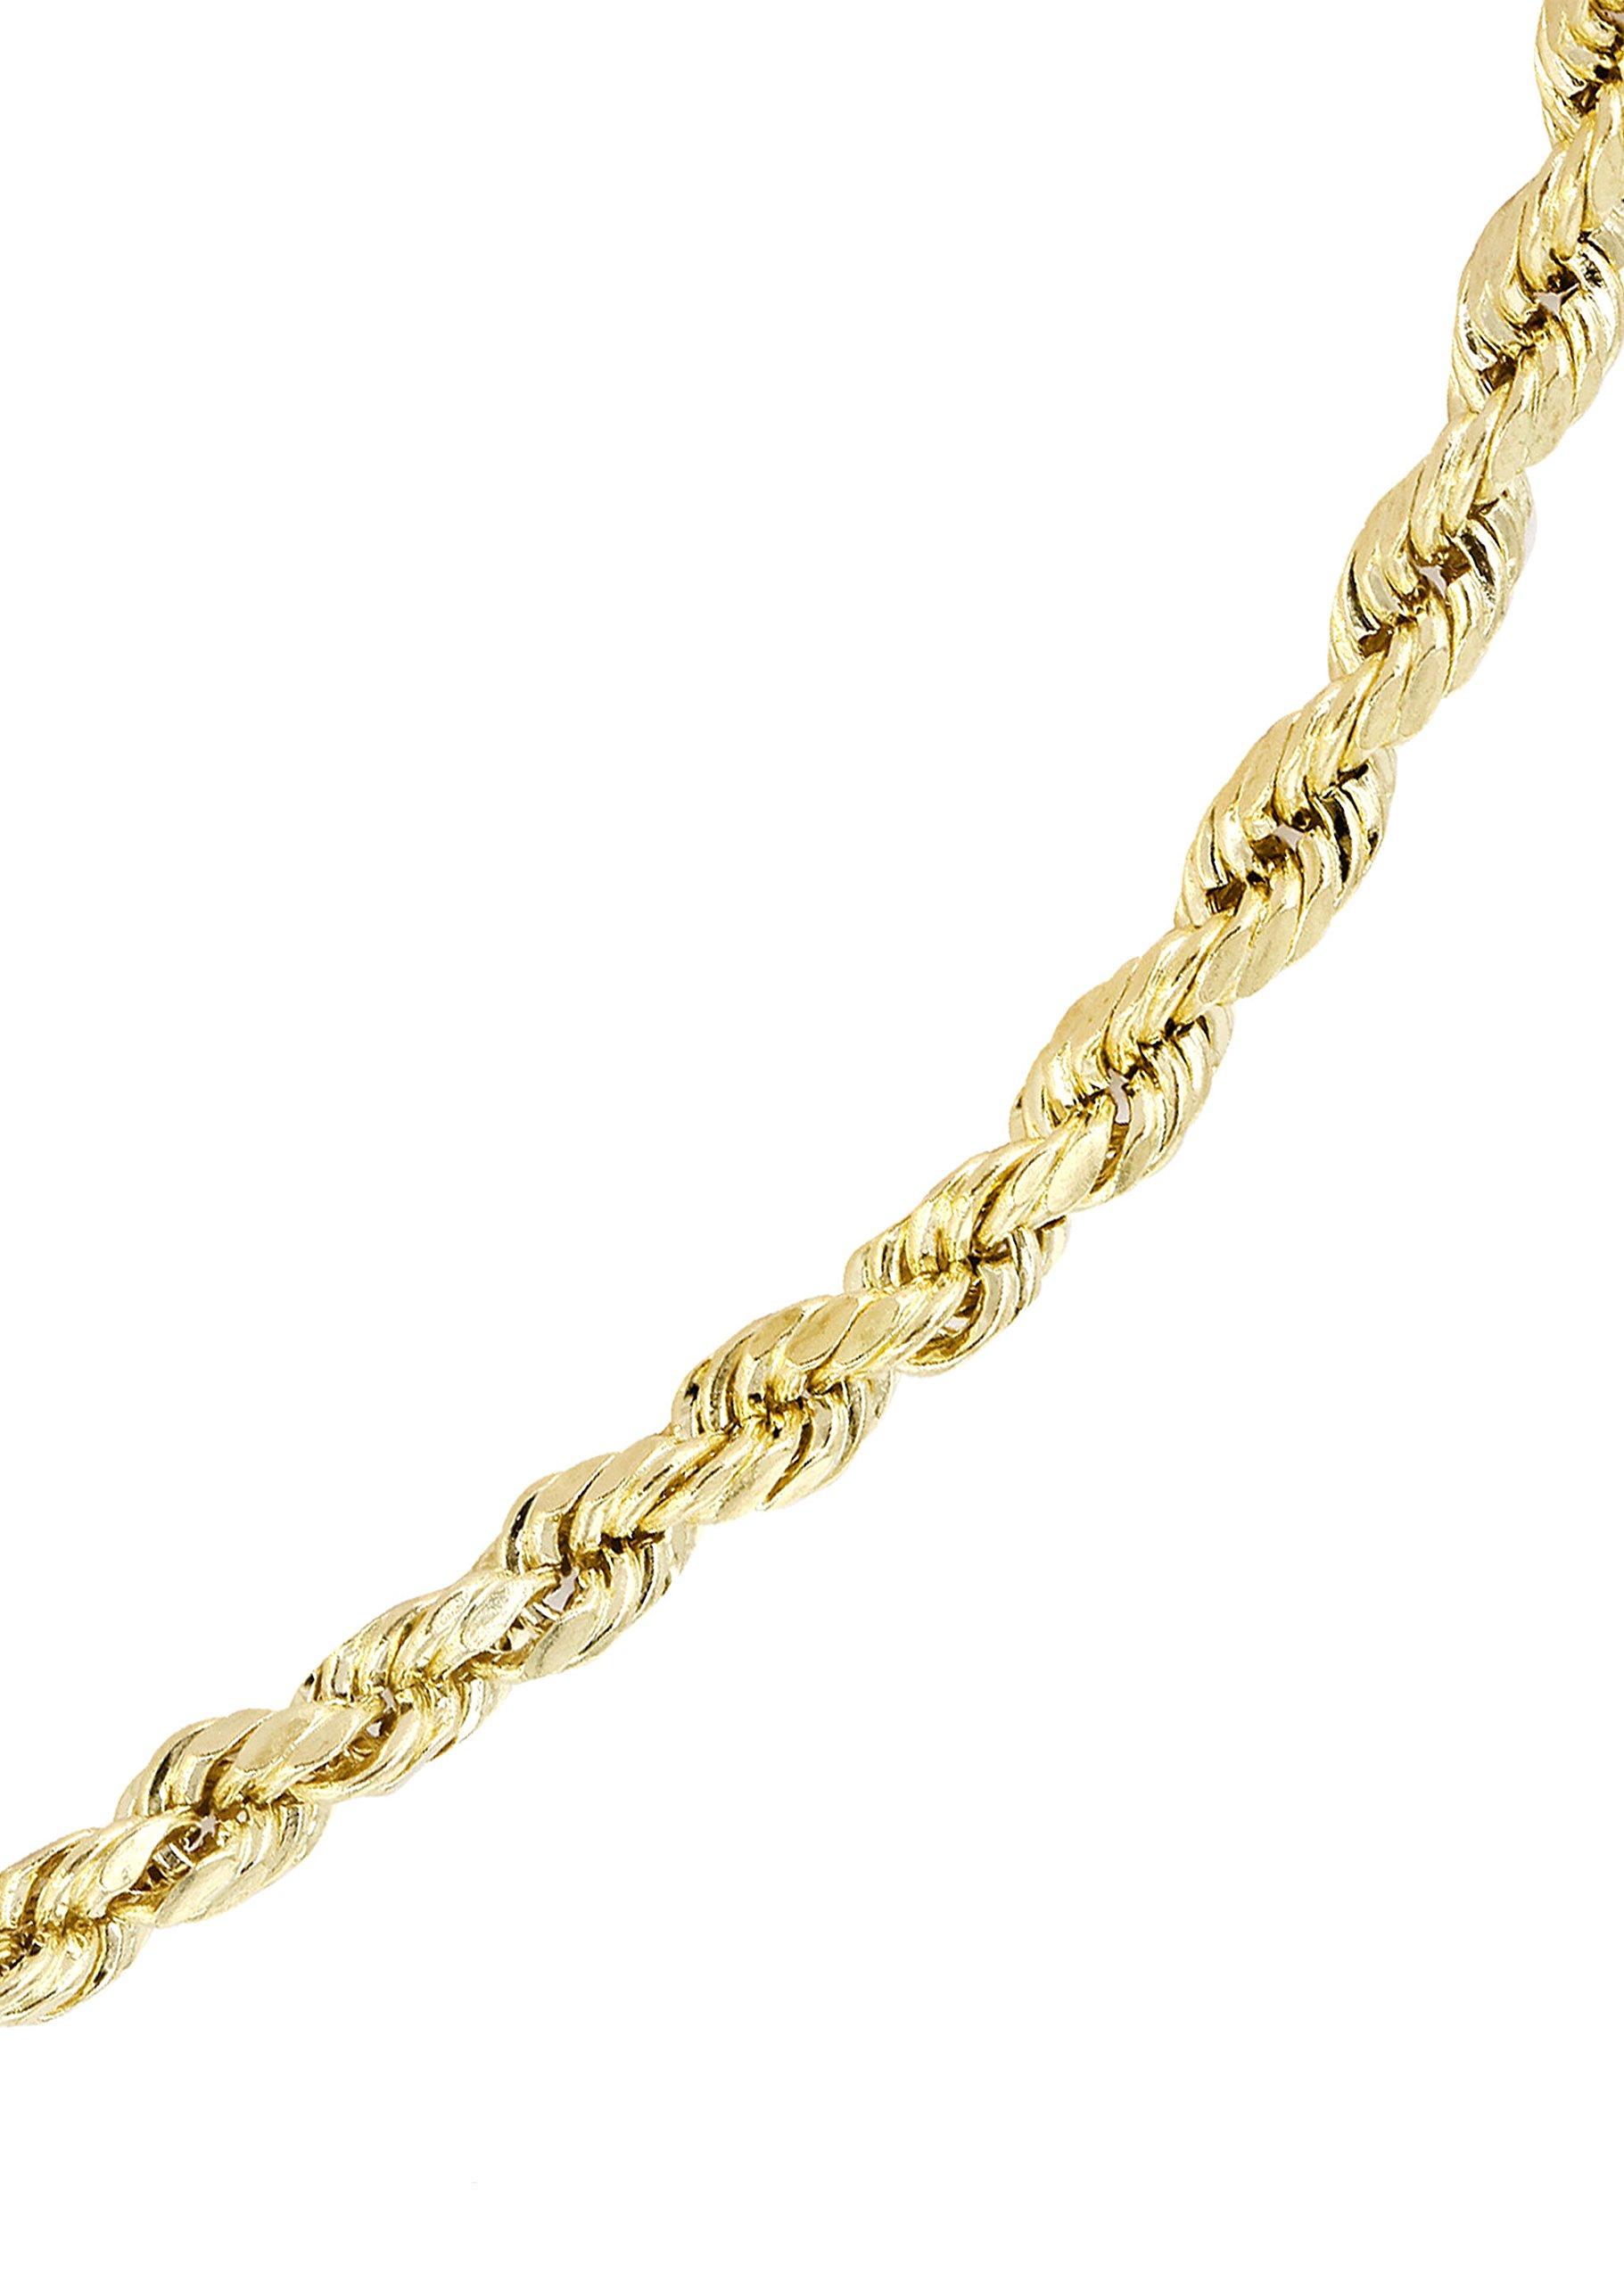 14k Gold Rope Bracelet